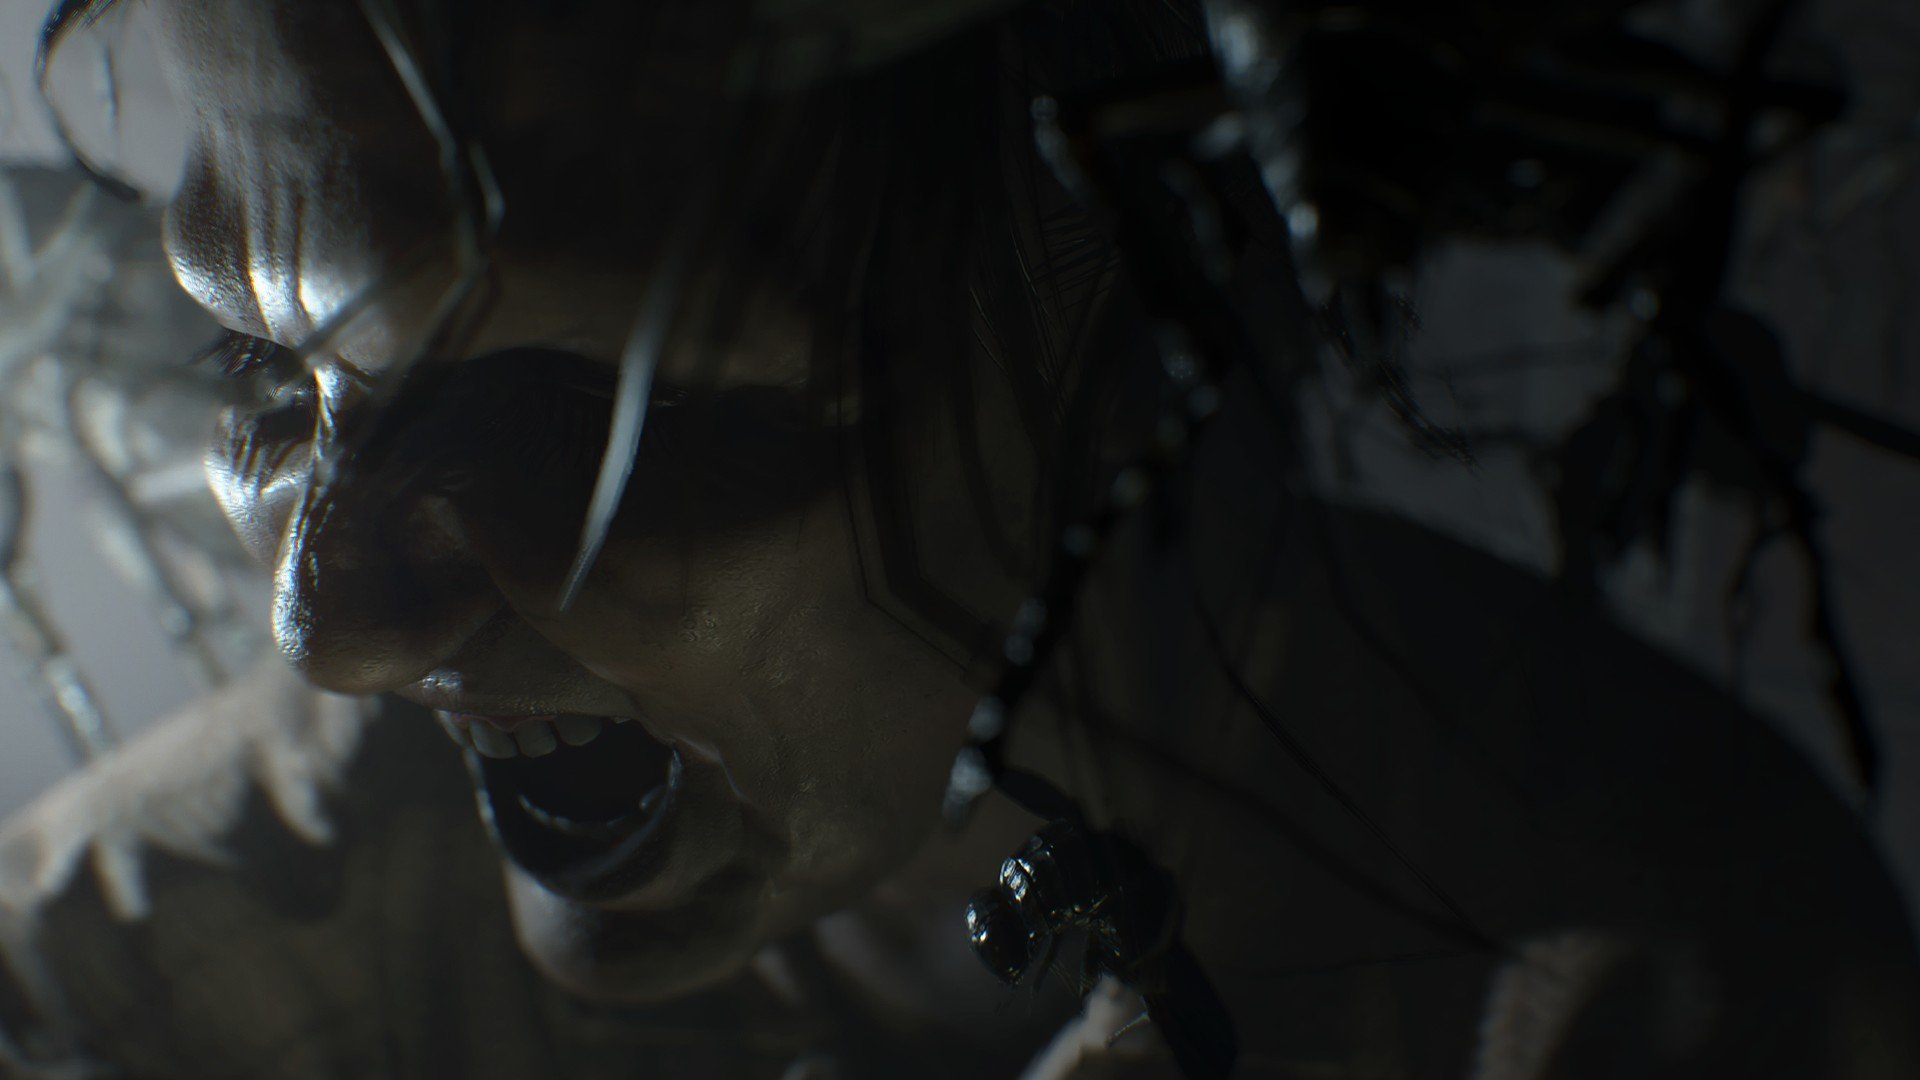 Download Hd 1080p Resident Evil 7 Biohazard Computer Background